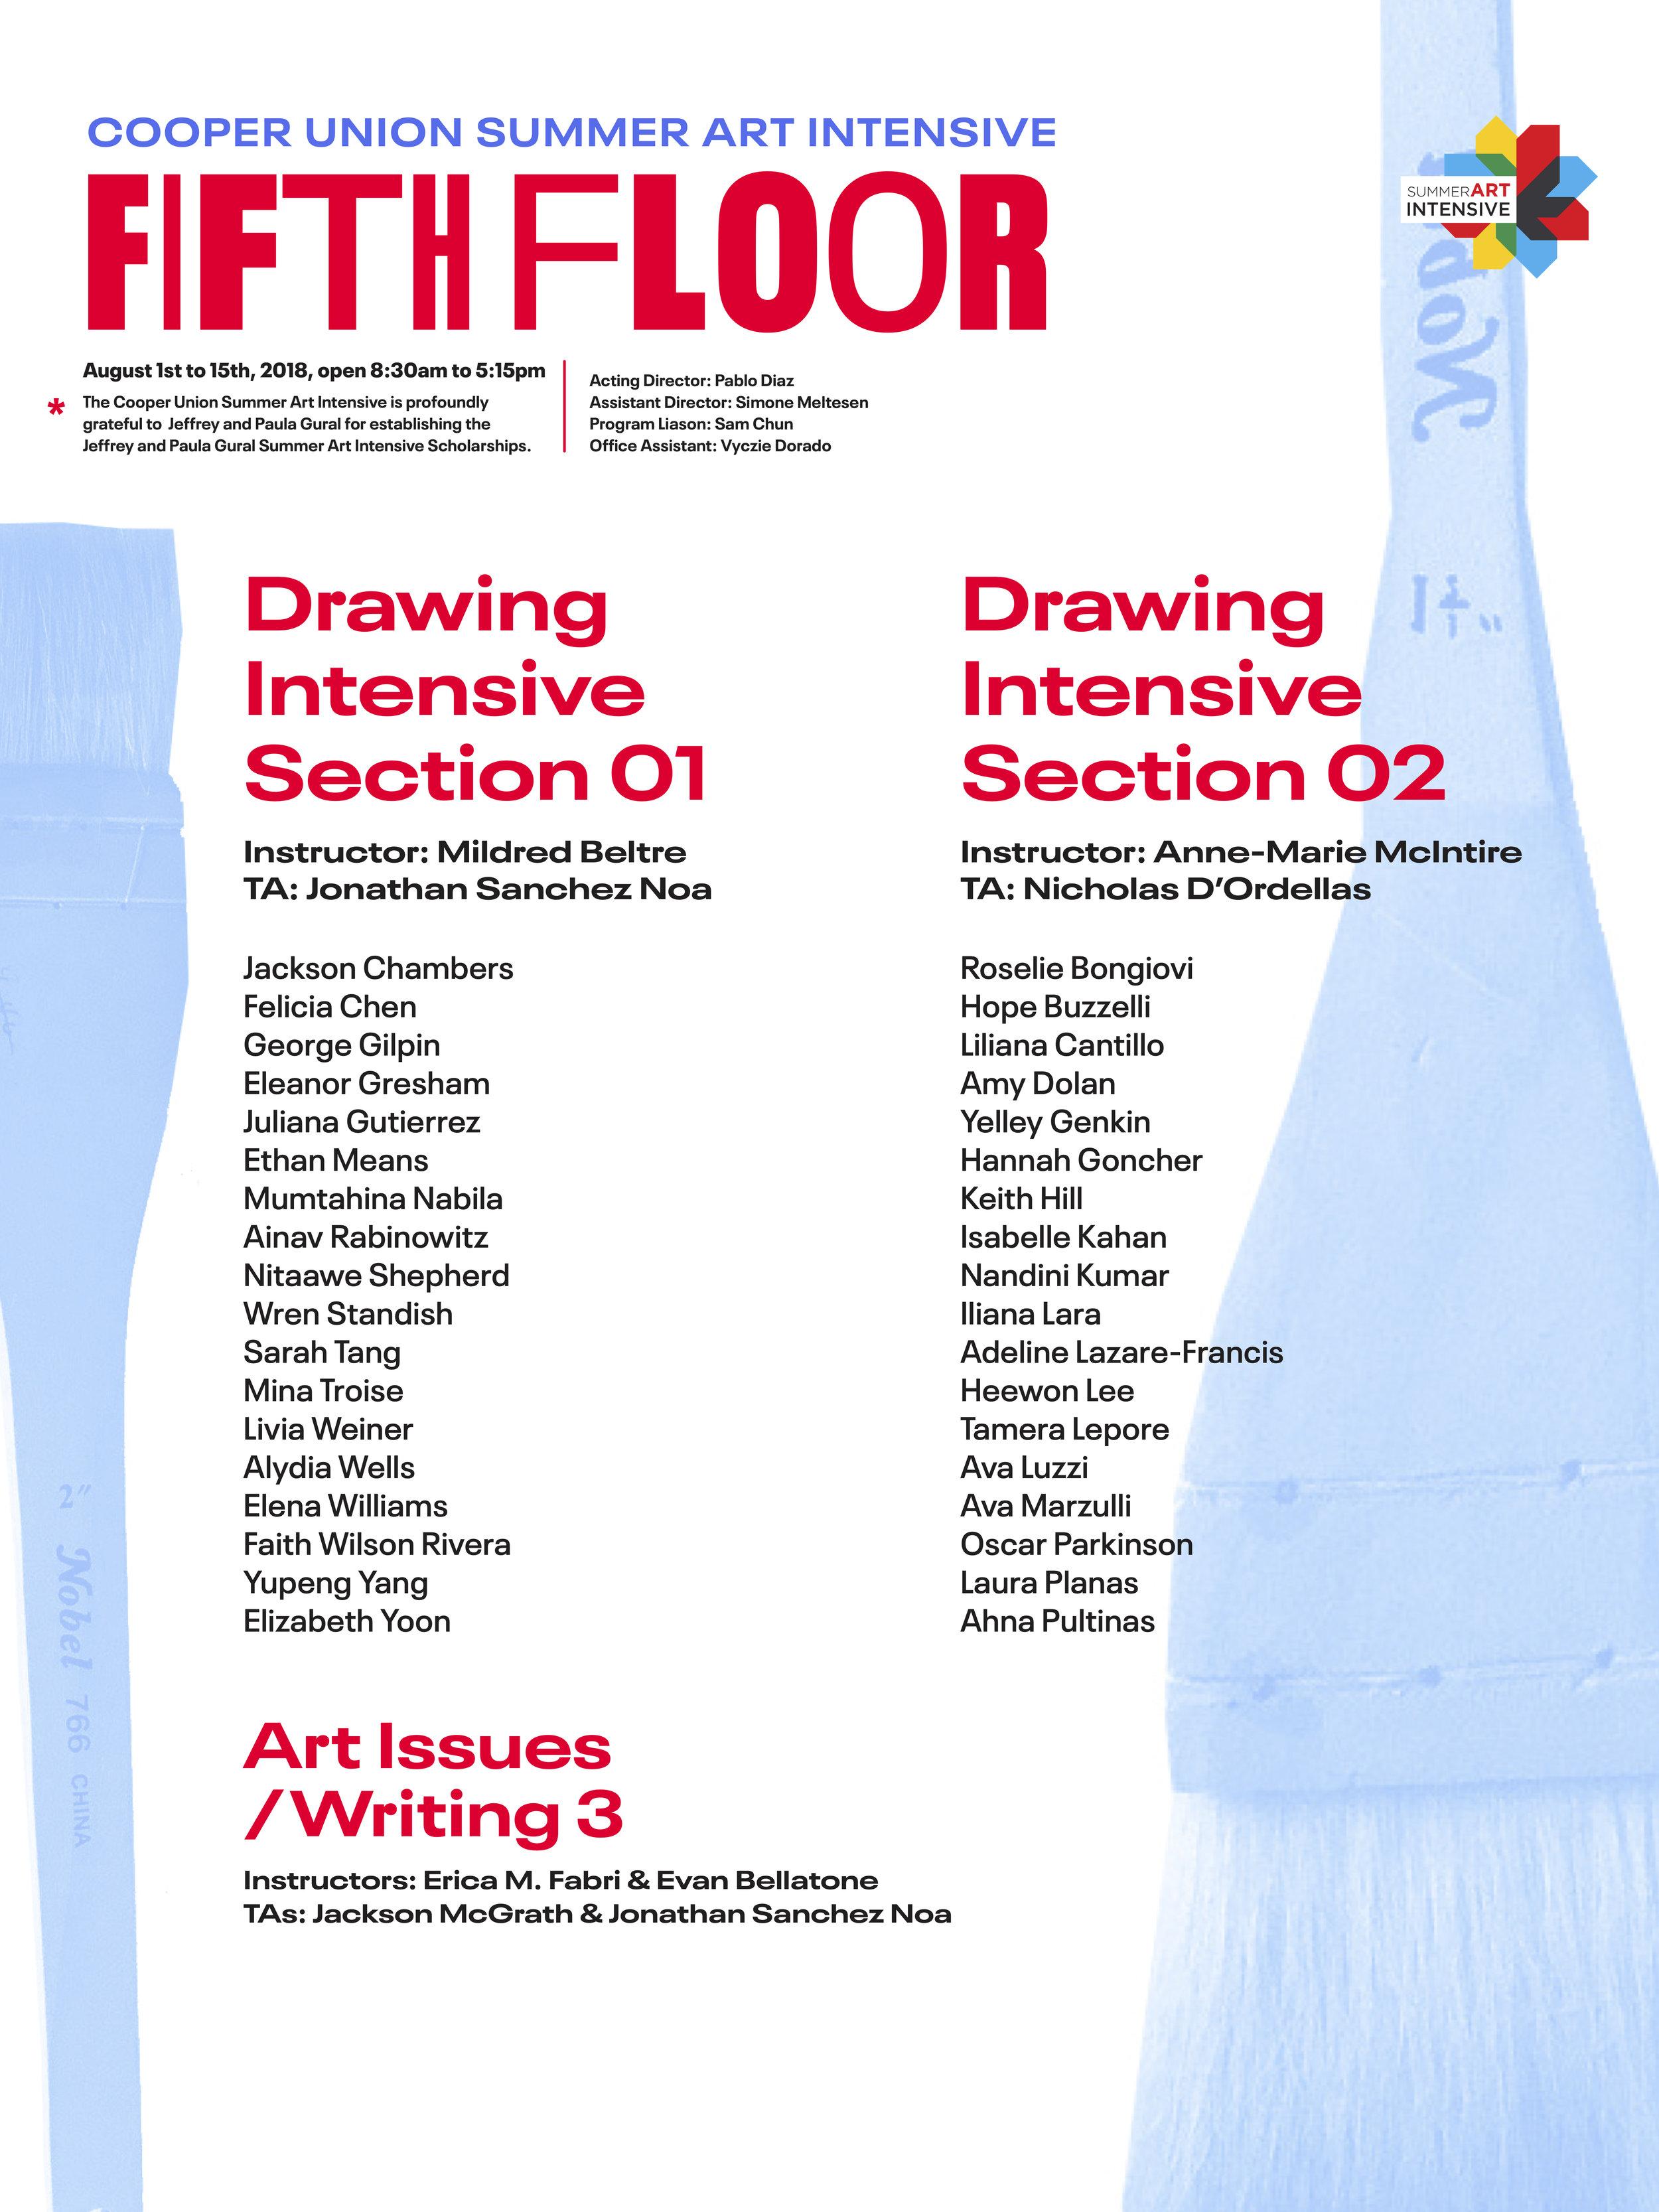 Exhibition Signage––72518.jpg